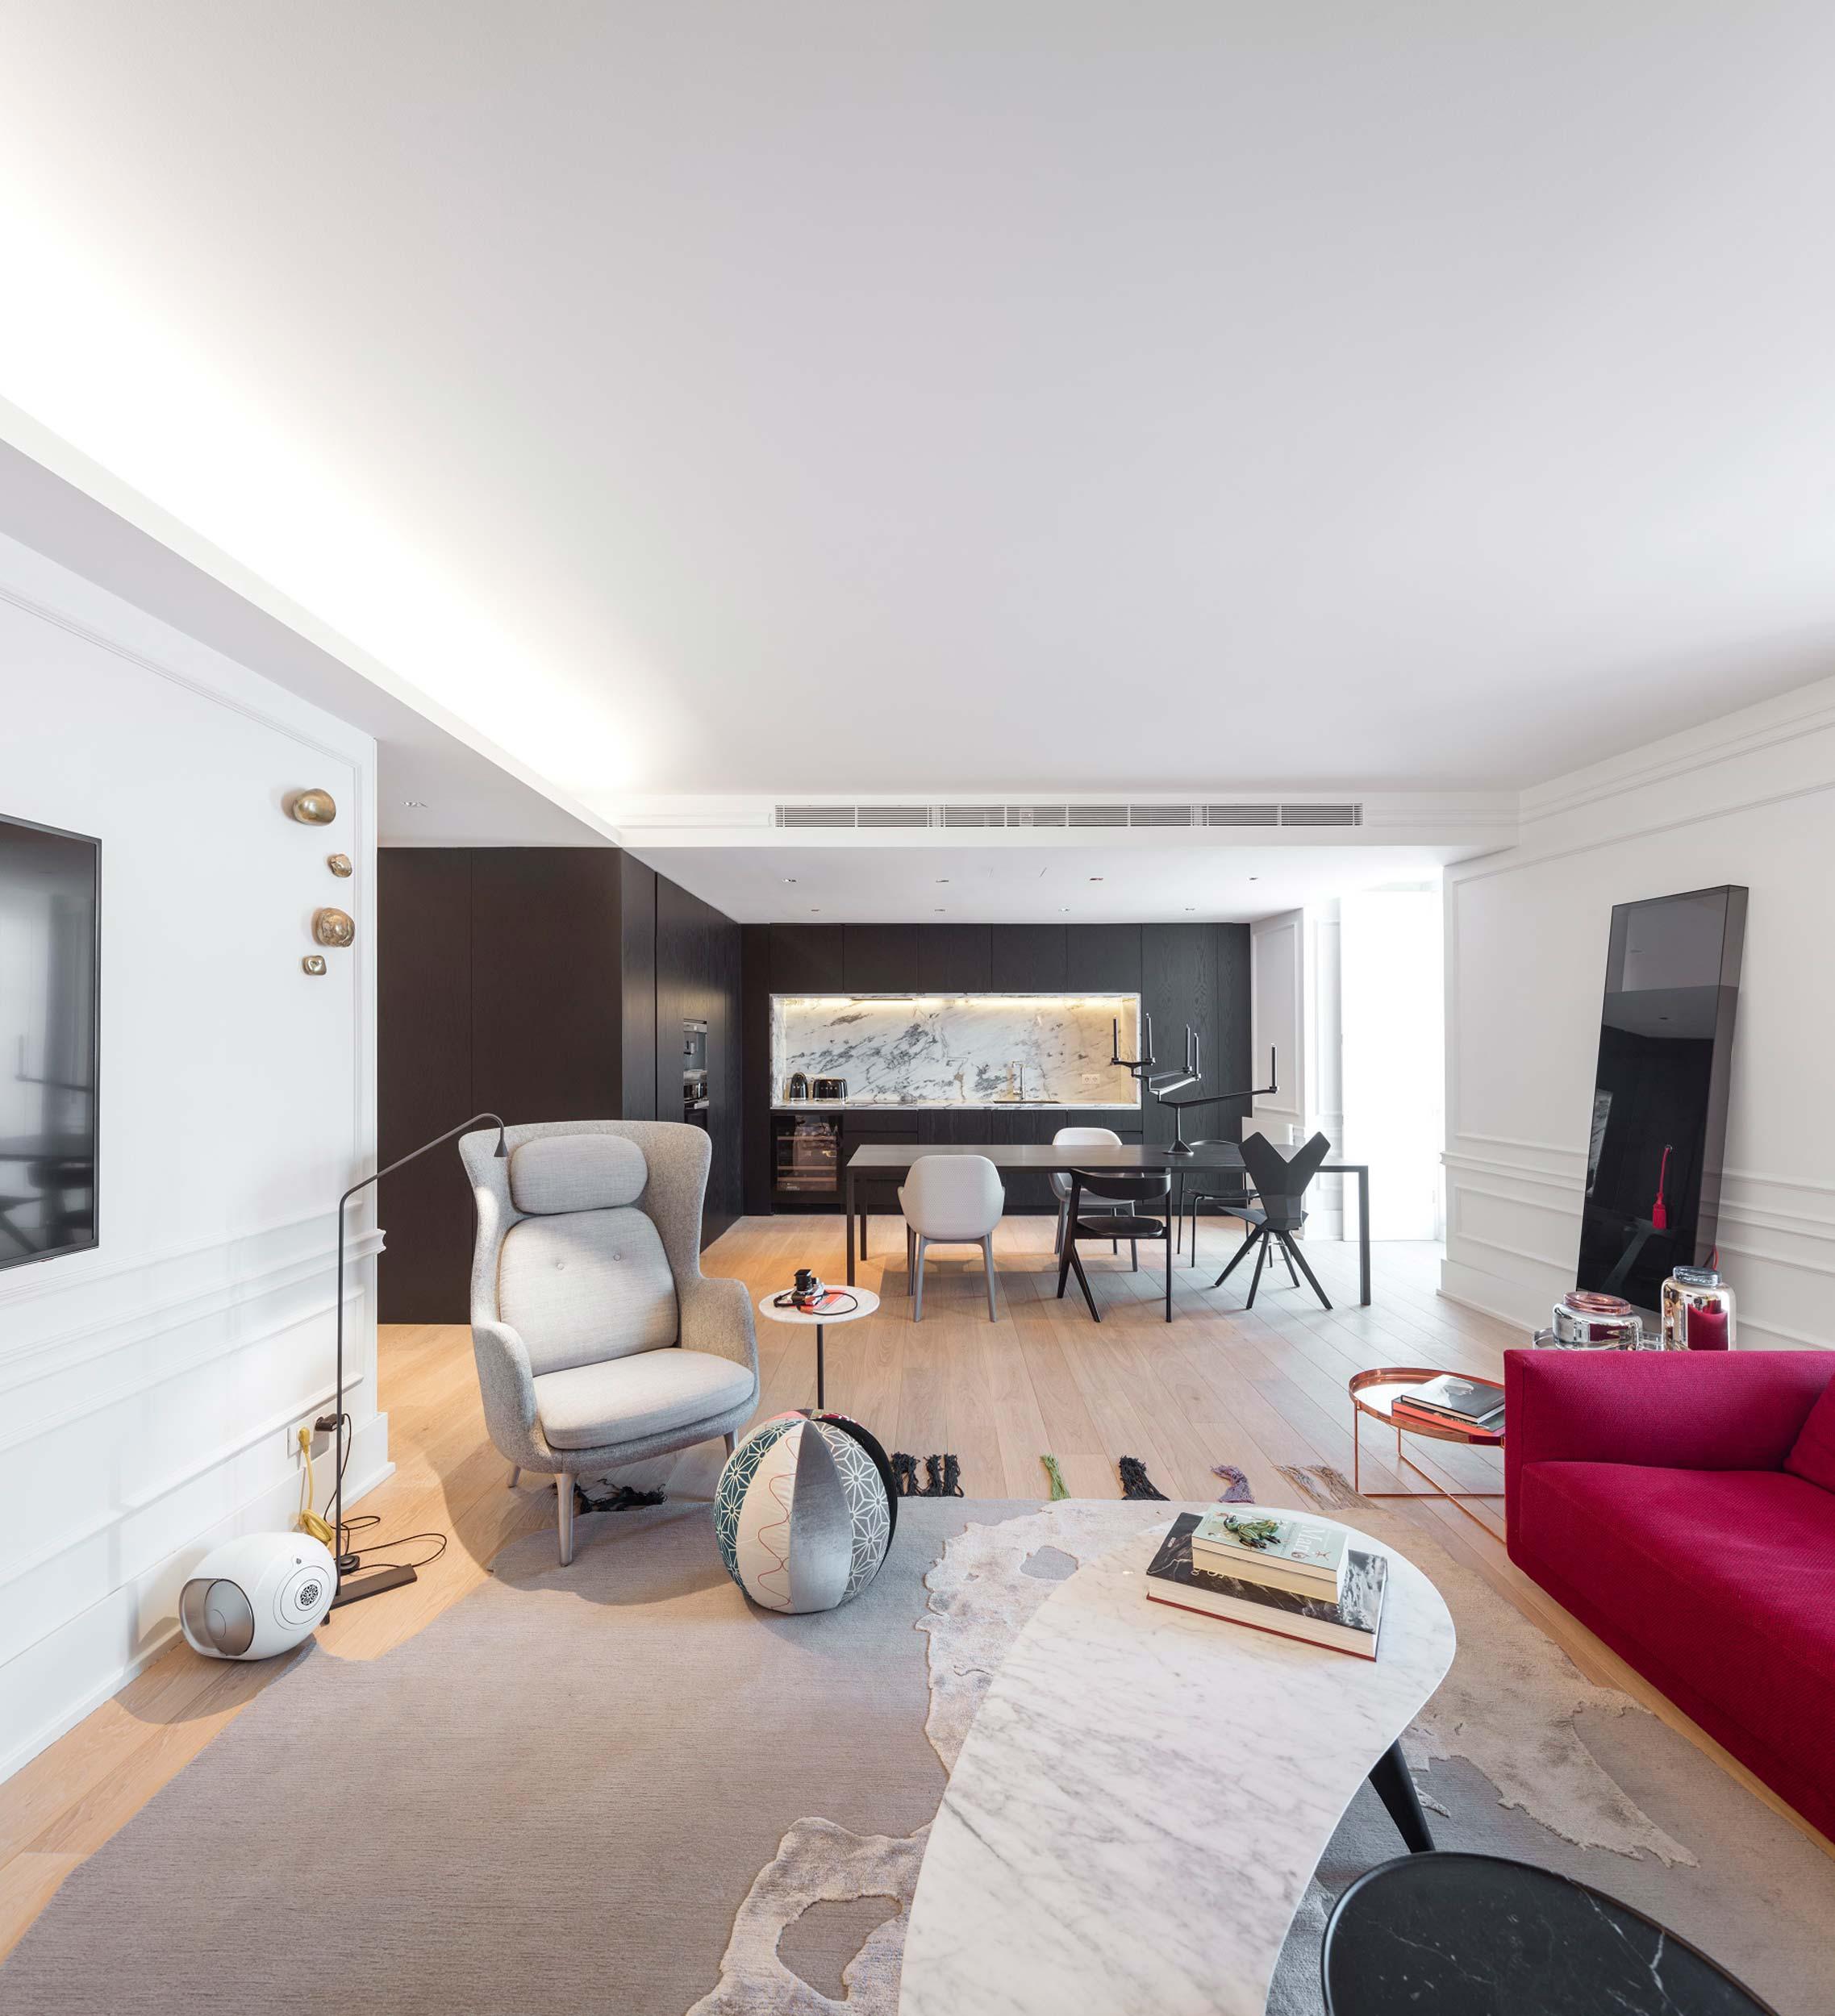 fernanda-marques-arquiteta-projeto-lx-7.JPG